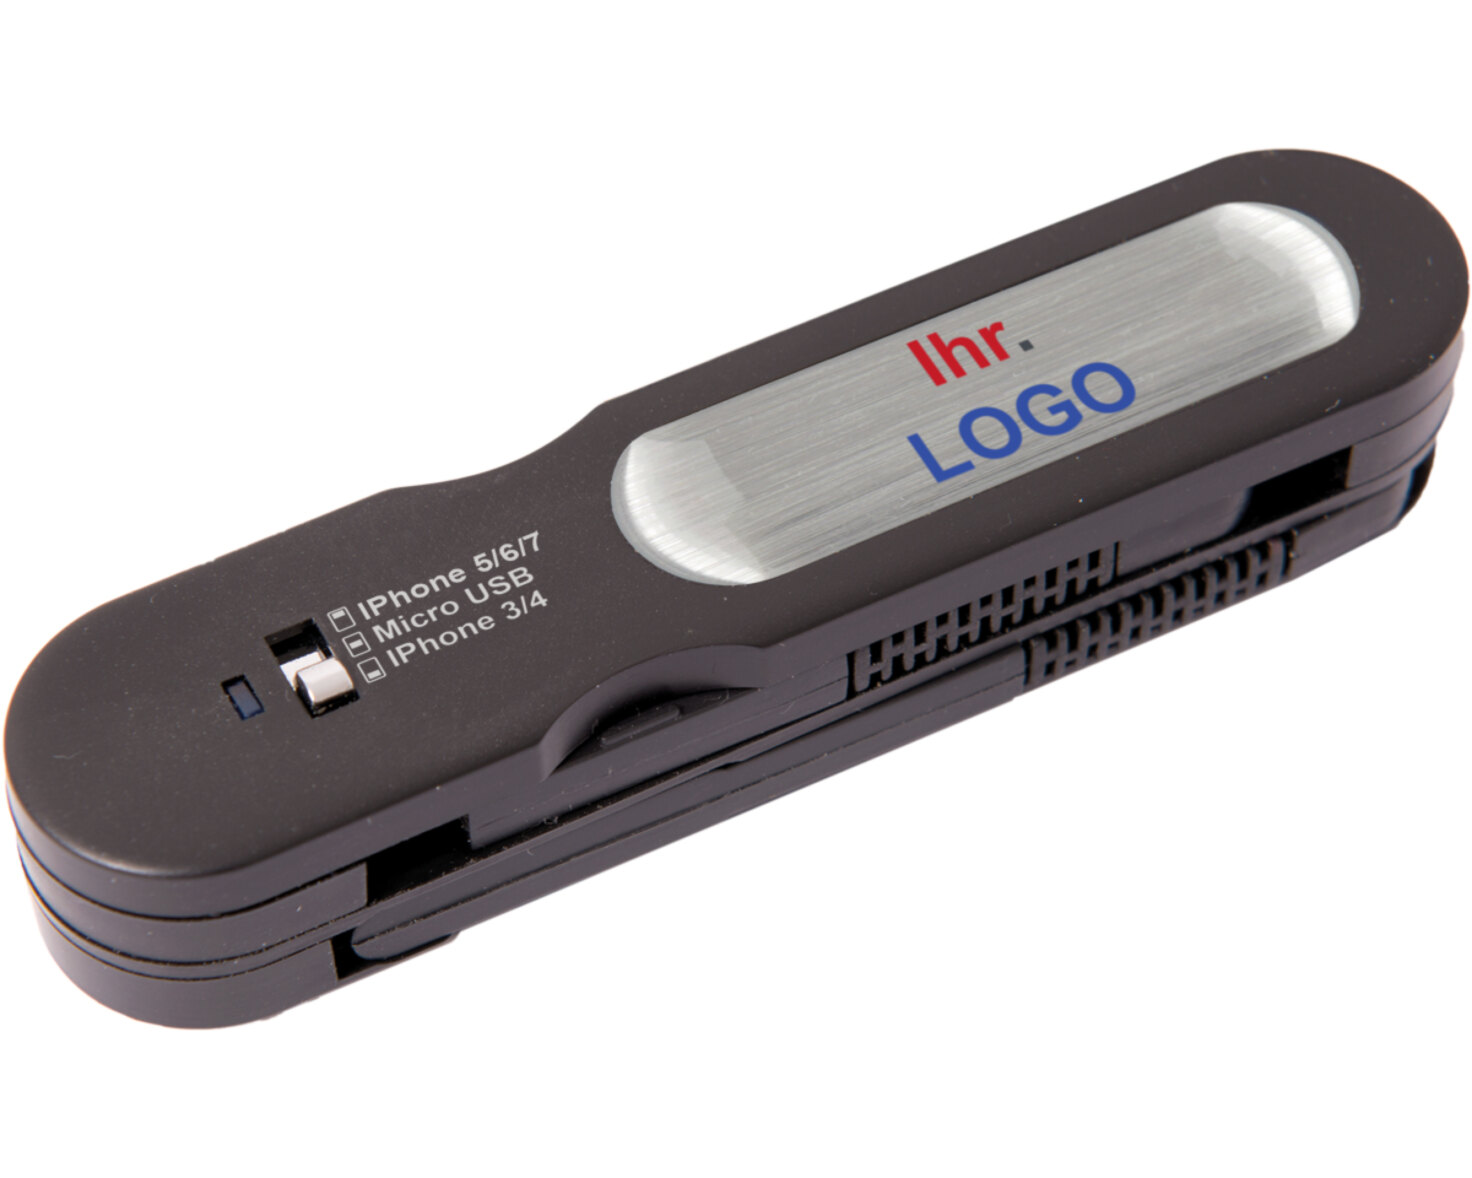 Multi USB Kabel Set V2 mit Ihrem Logo